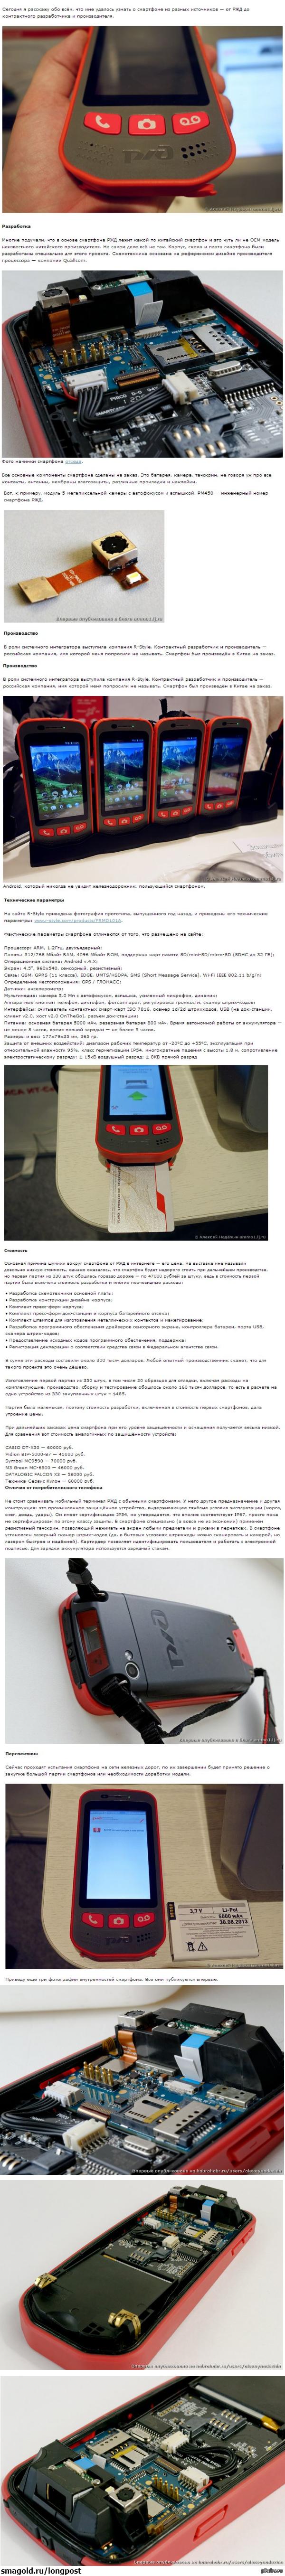 РЖД разработали свой смартфон Оригинал: http://habrahabr.ru/company/boxowerview/blog/202698/